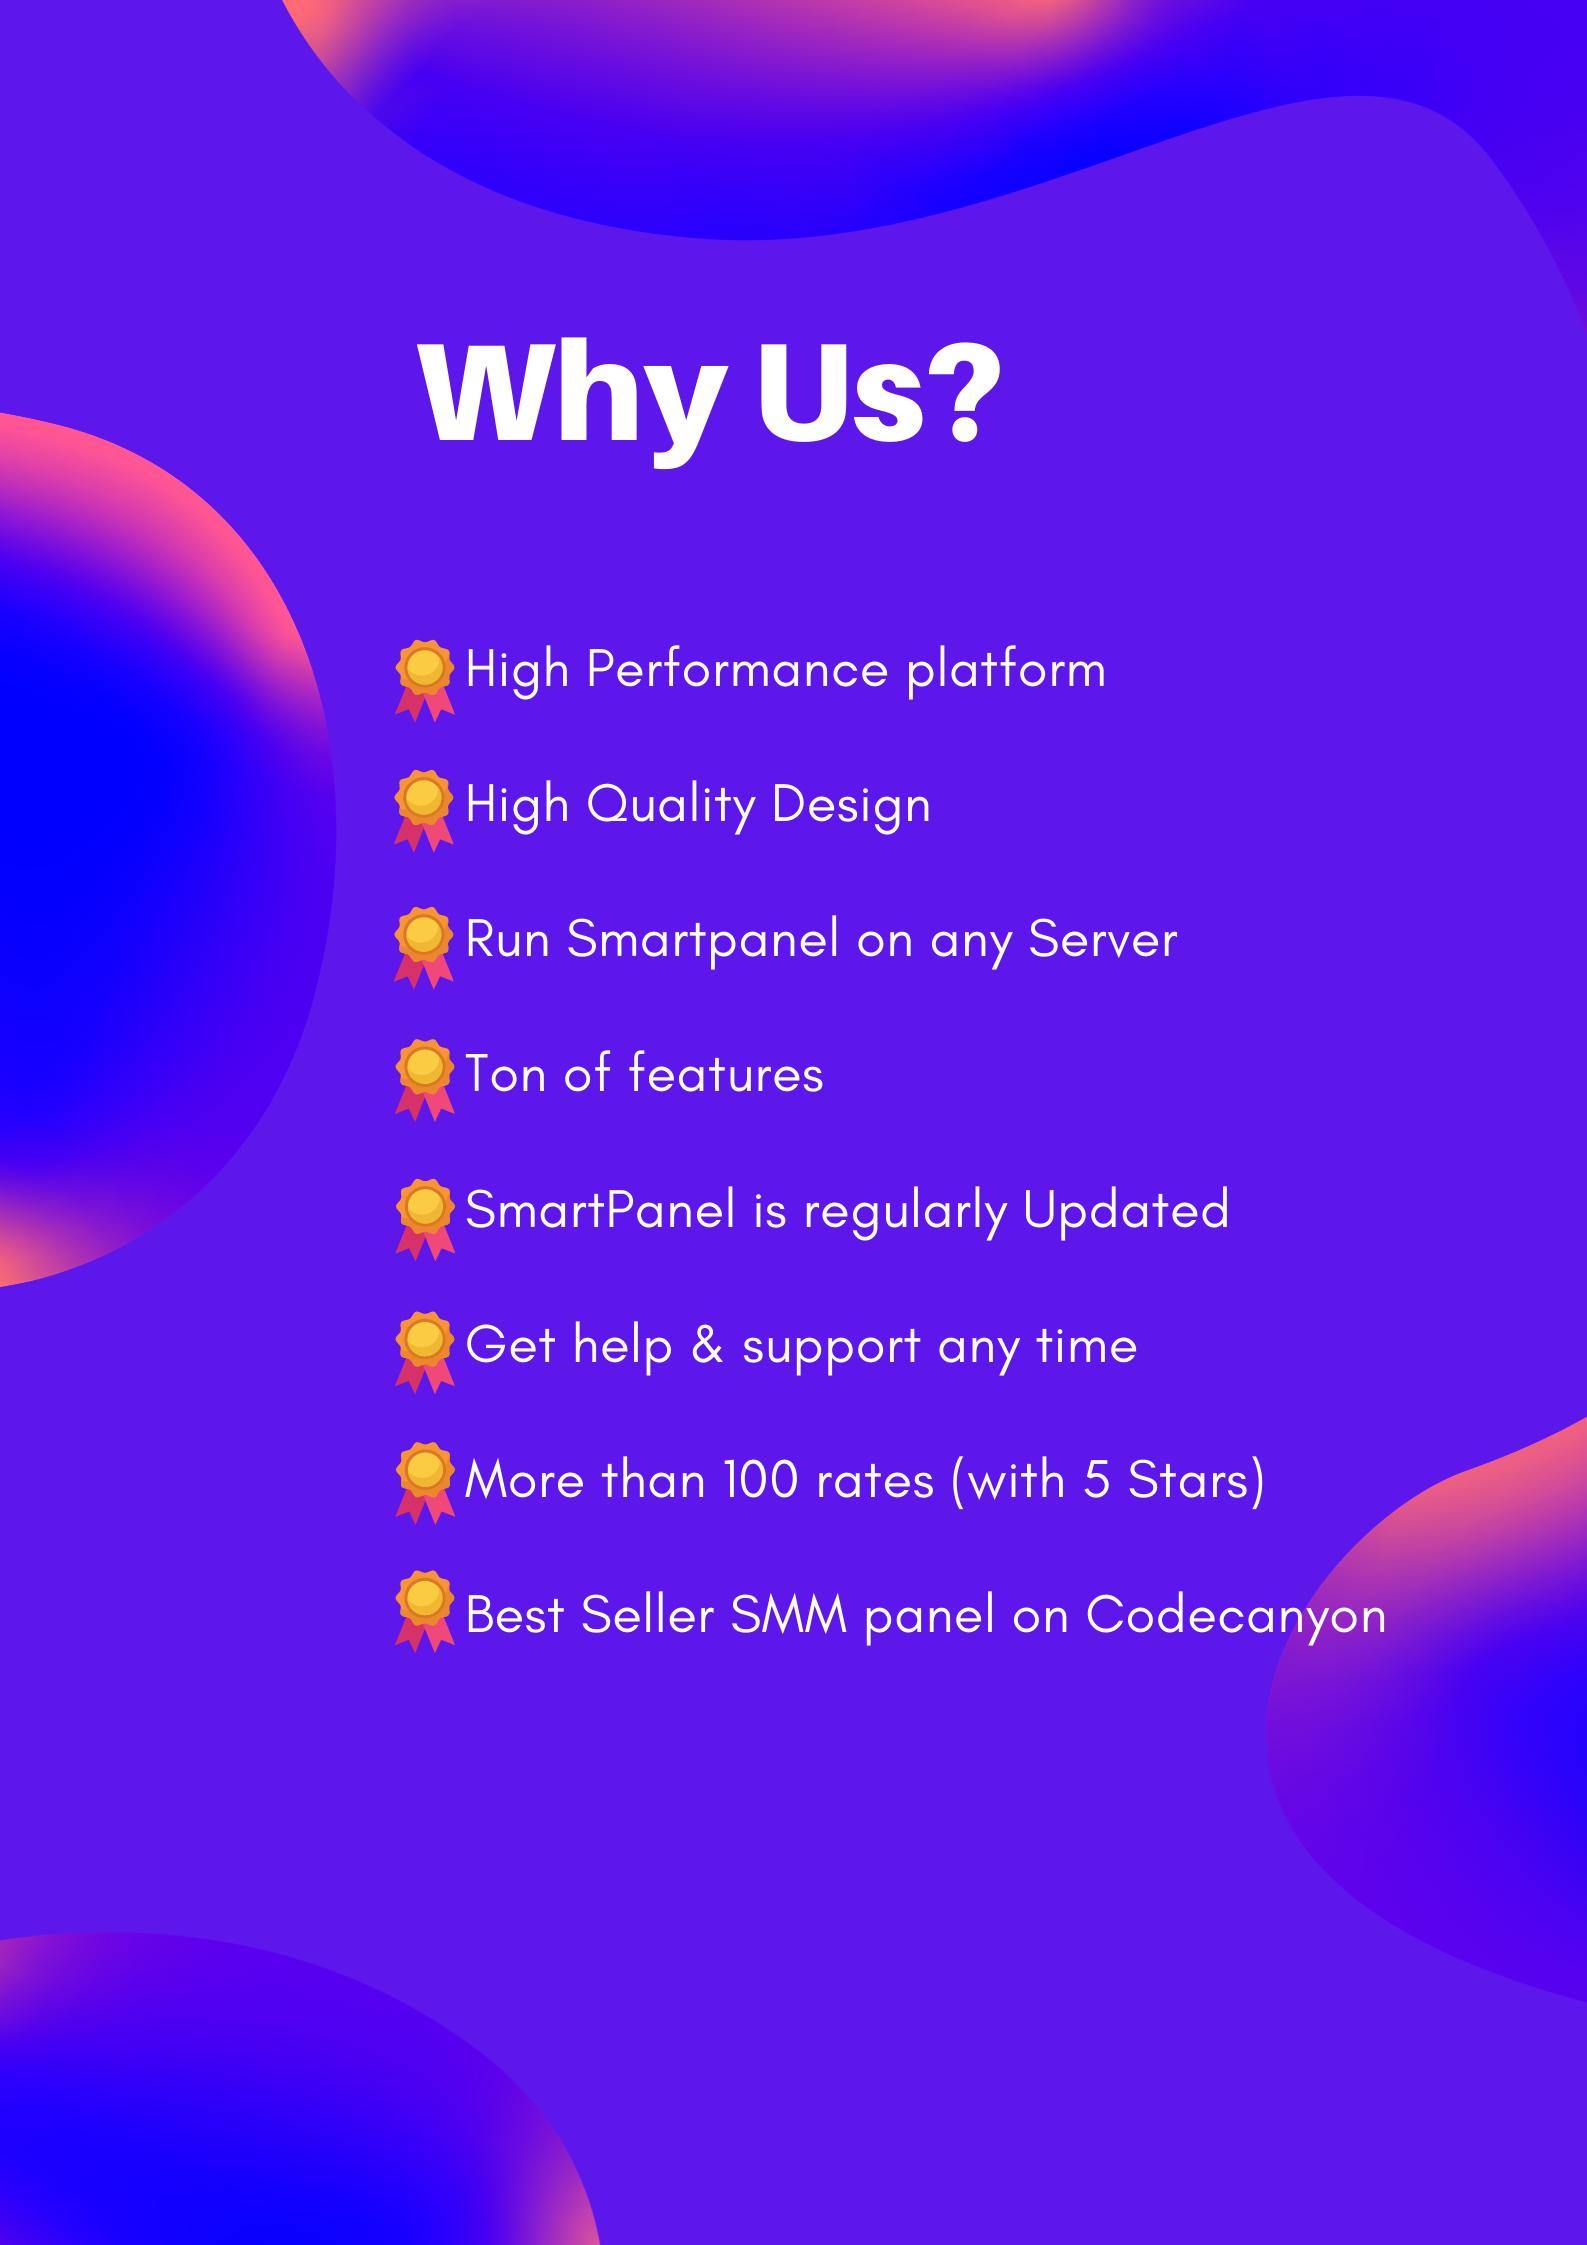 Smartpanel - Why Us